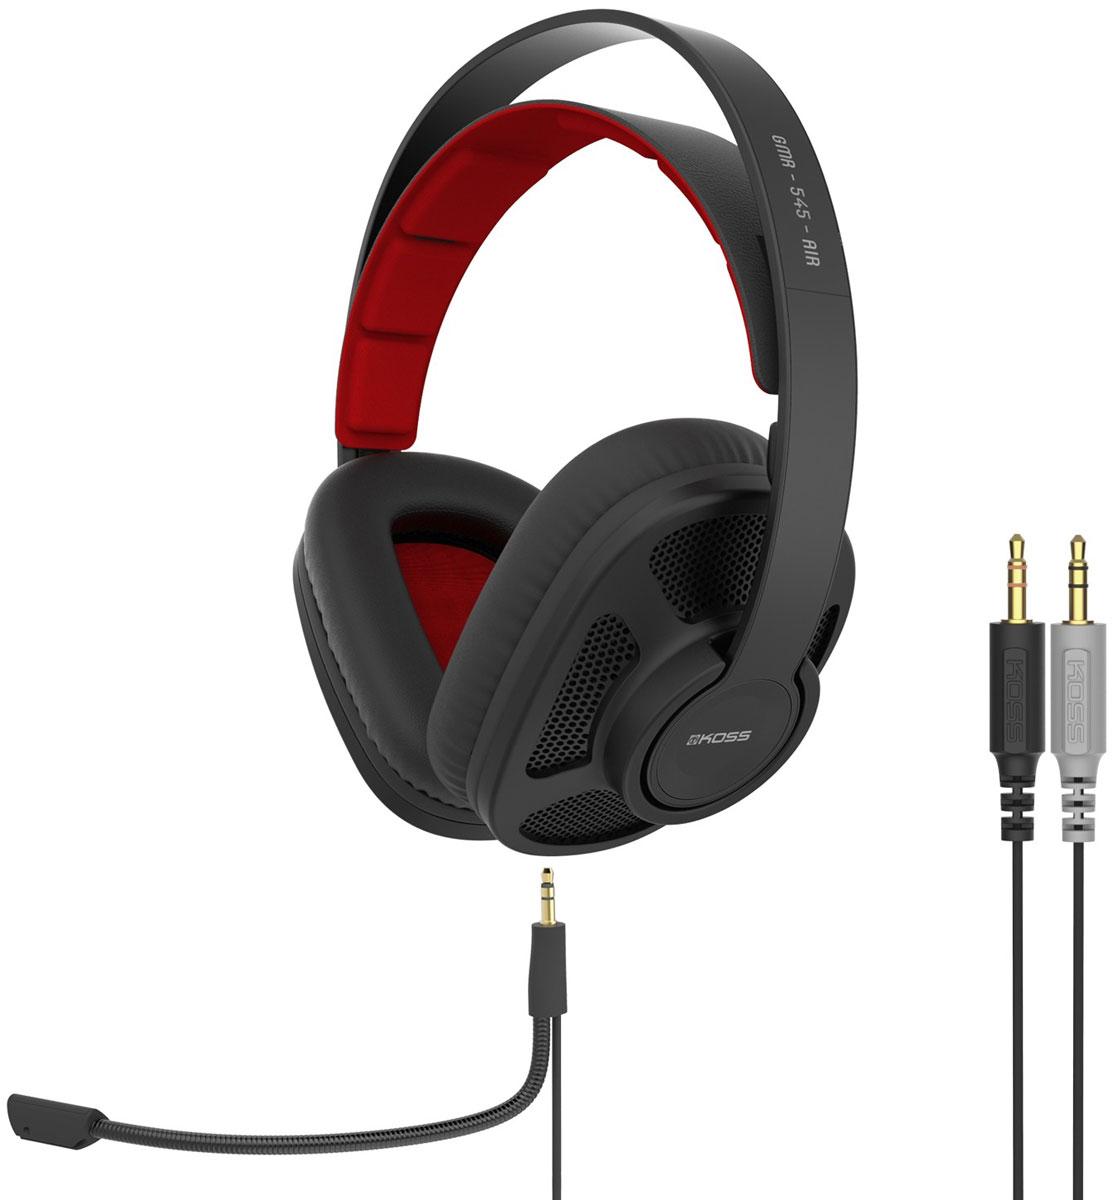 Koss GMR-545-AIR игровые наушники tritton ark 100 stereo headset black игровые наушники для ps 4